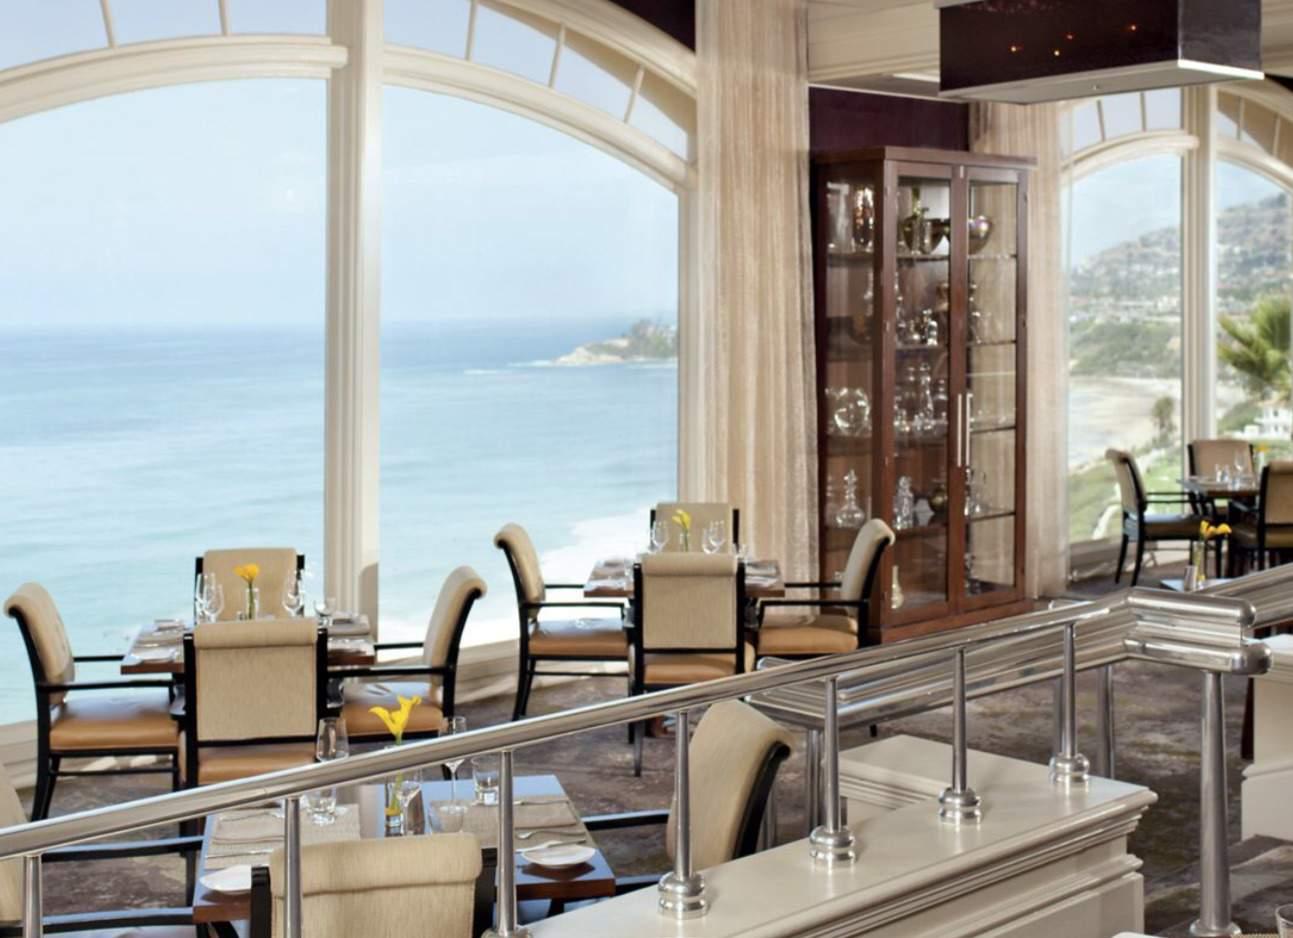 Raya Ritz Carlton Laguna Niguel interior with big windows and ocean views